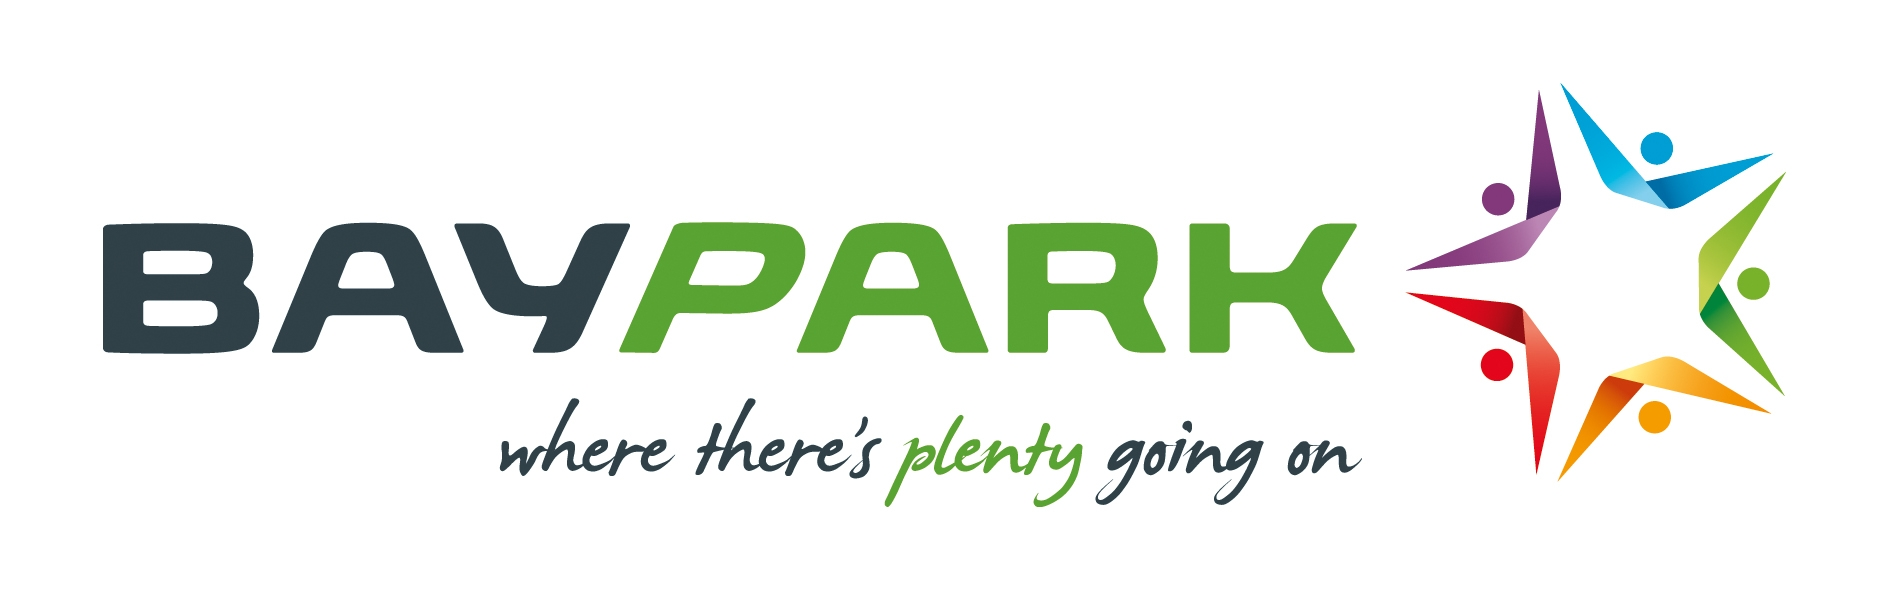 new_baypark_logo.JPG